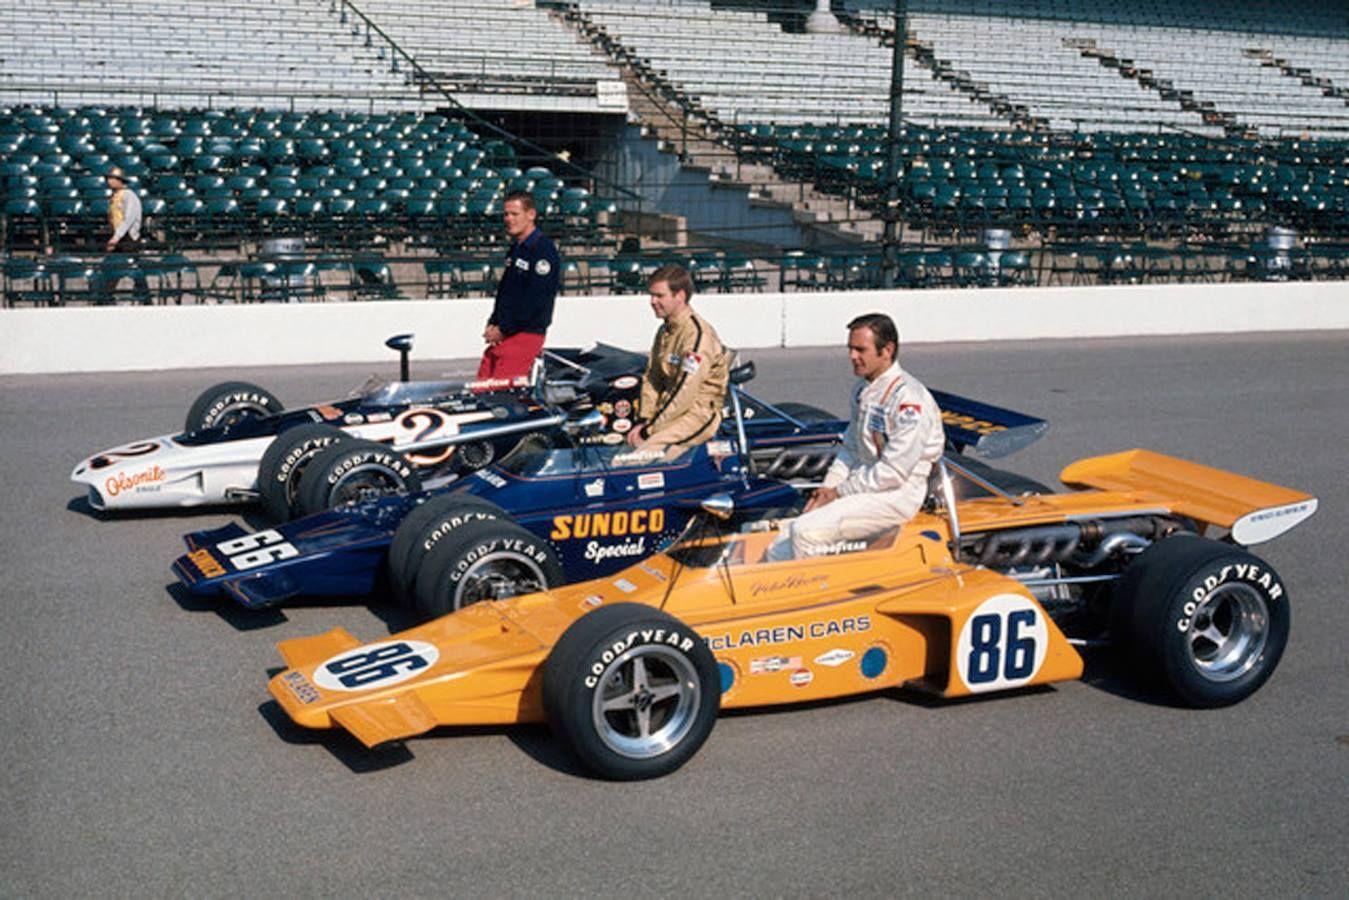 BOBBY ALLISON 1973 INDY 500 AUTO RACING 8X10 PHOTO